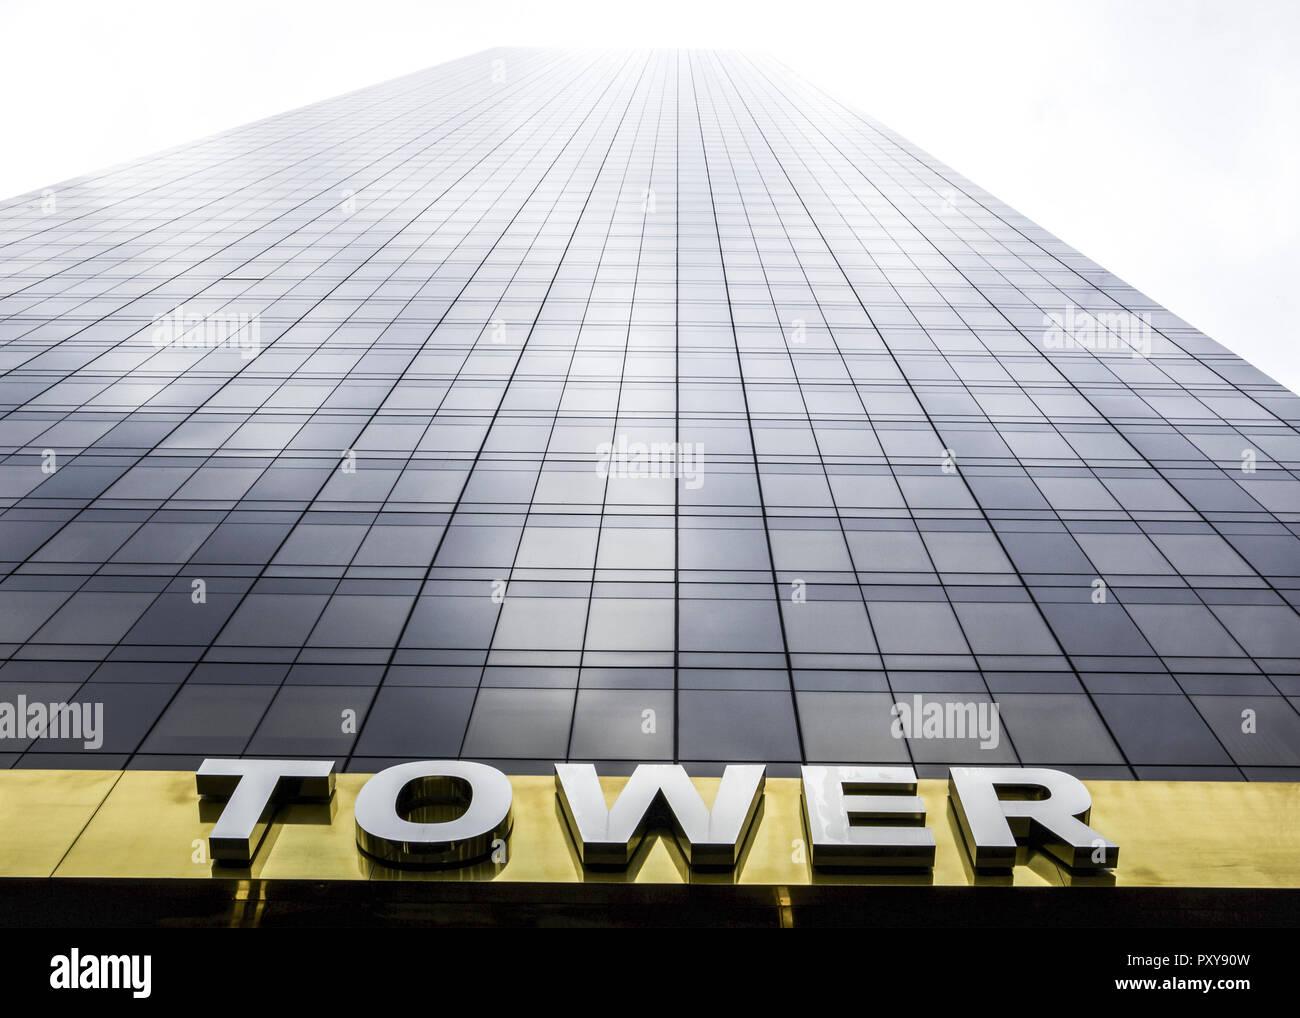 Wolkenkratzer, Trump Tower, New York, USA - Stock Image